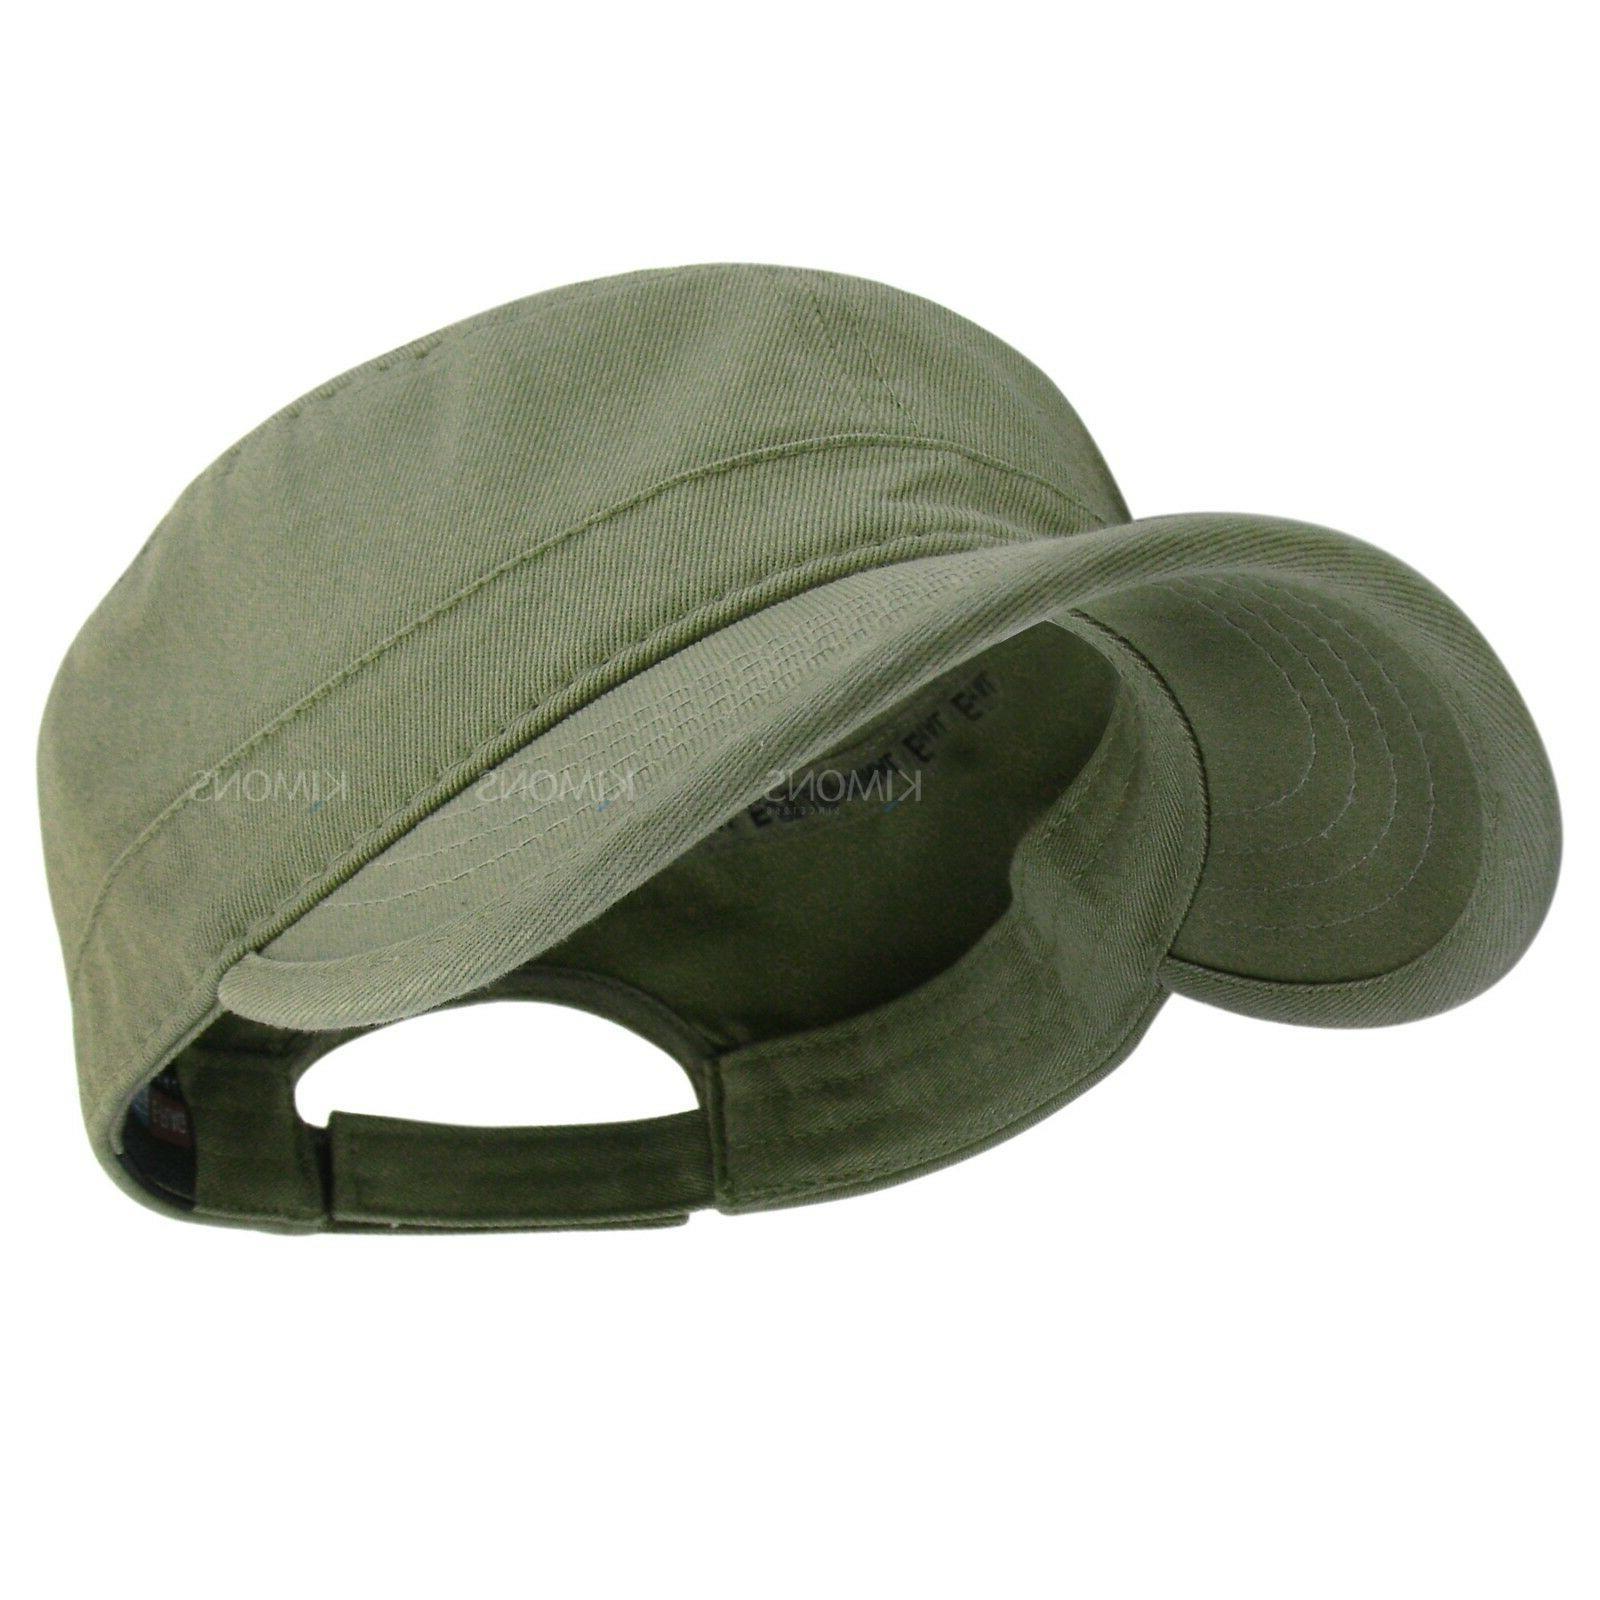 Army Cadet Castro